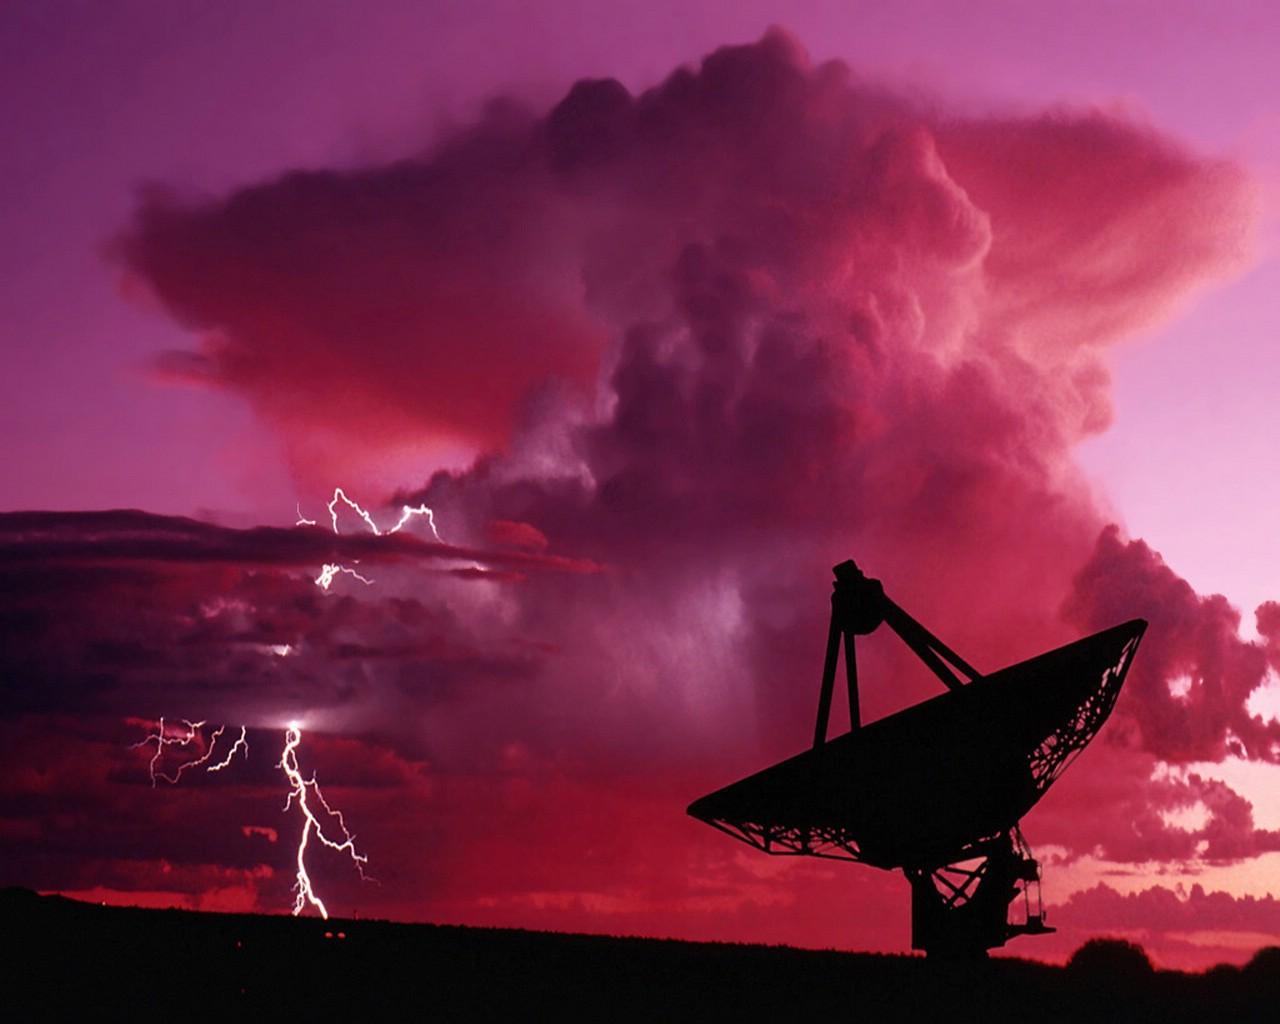 Lightning storms fun facts